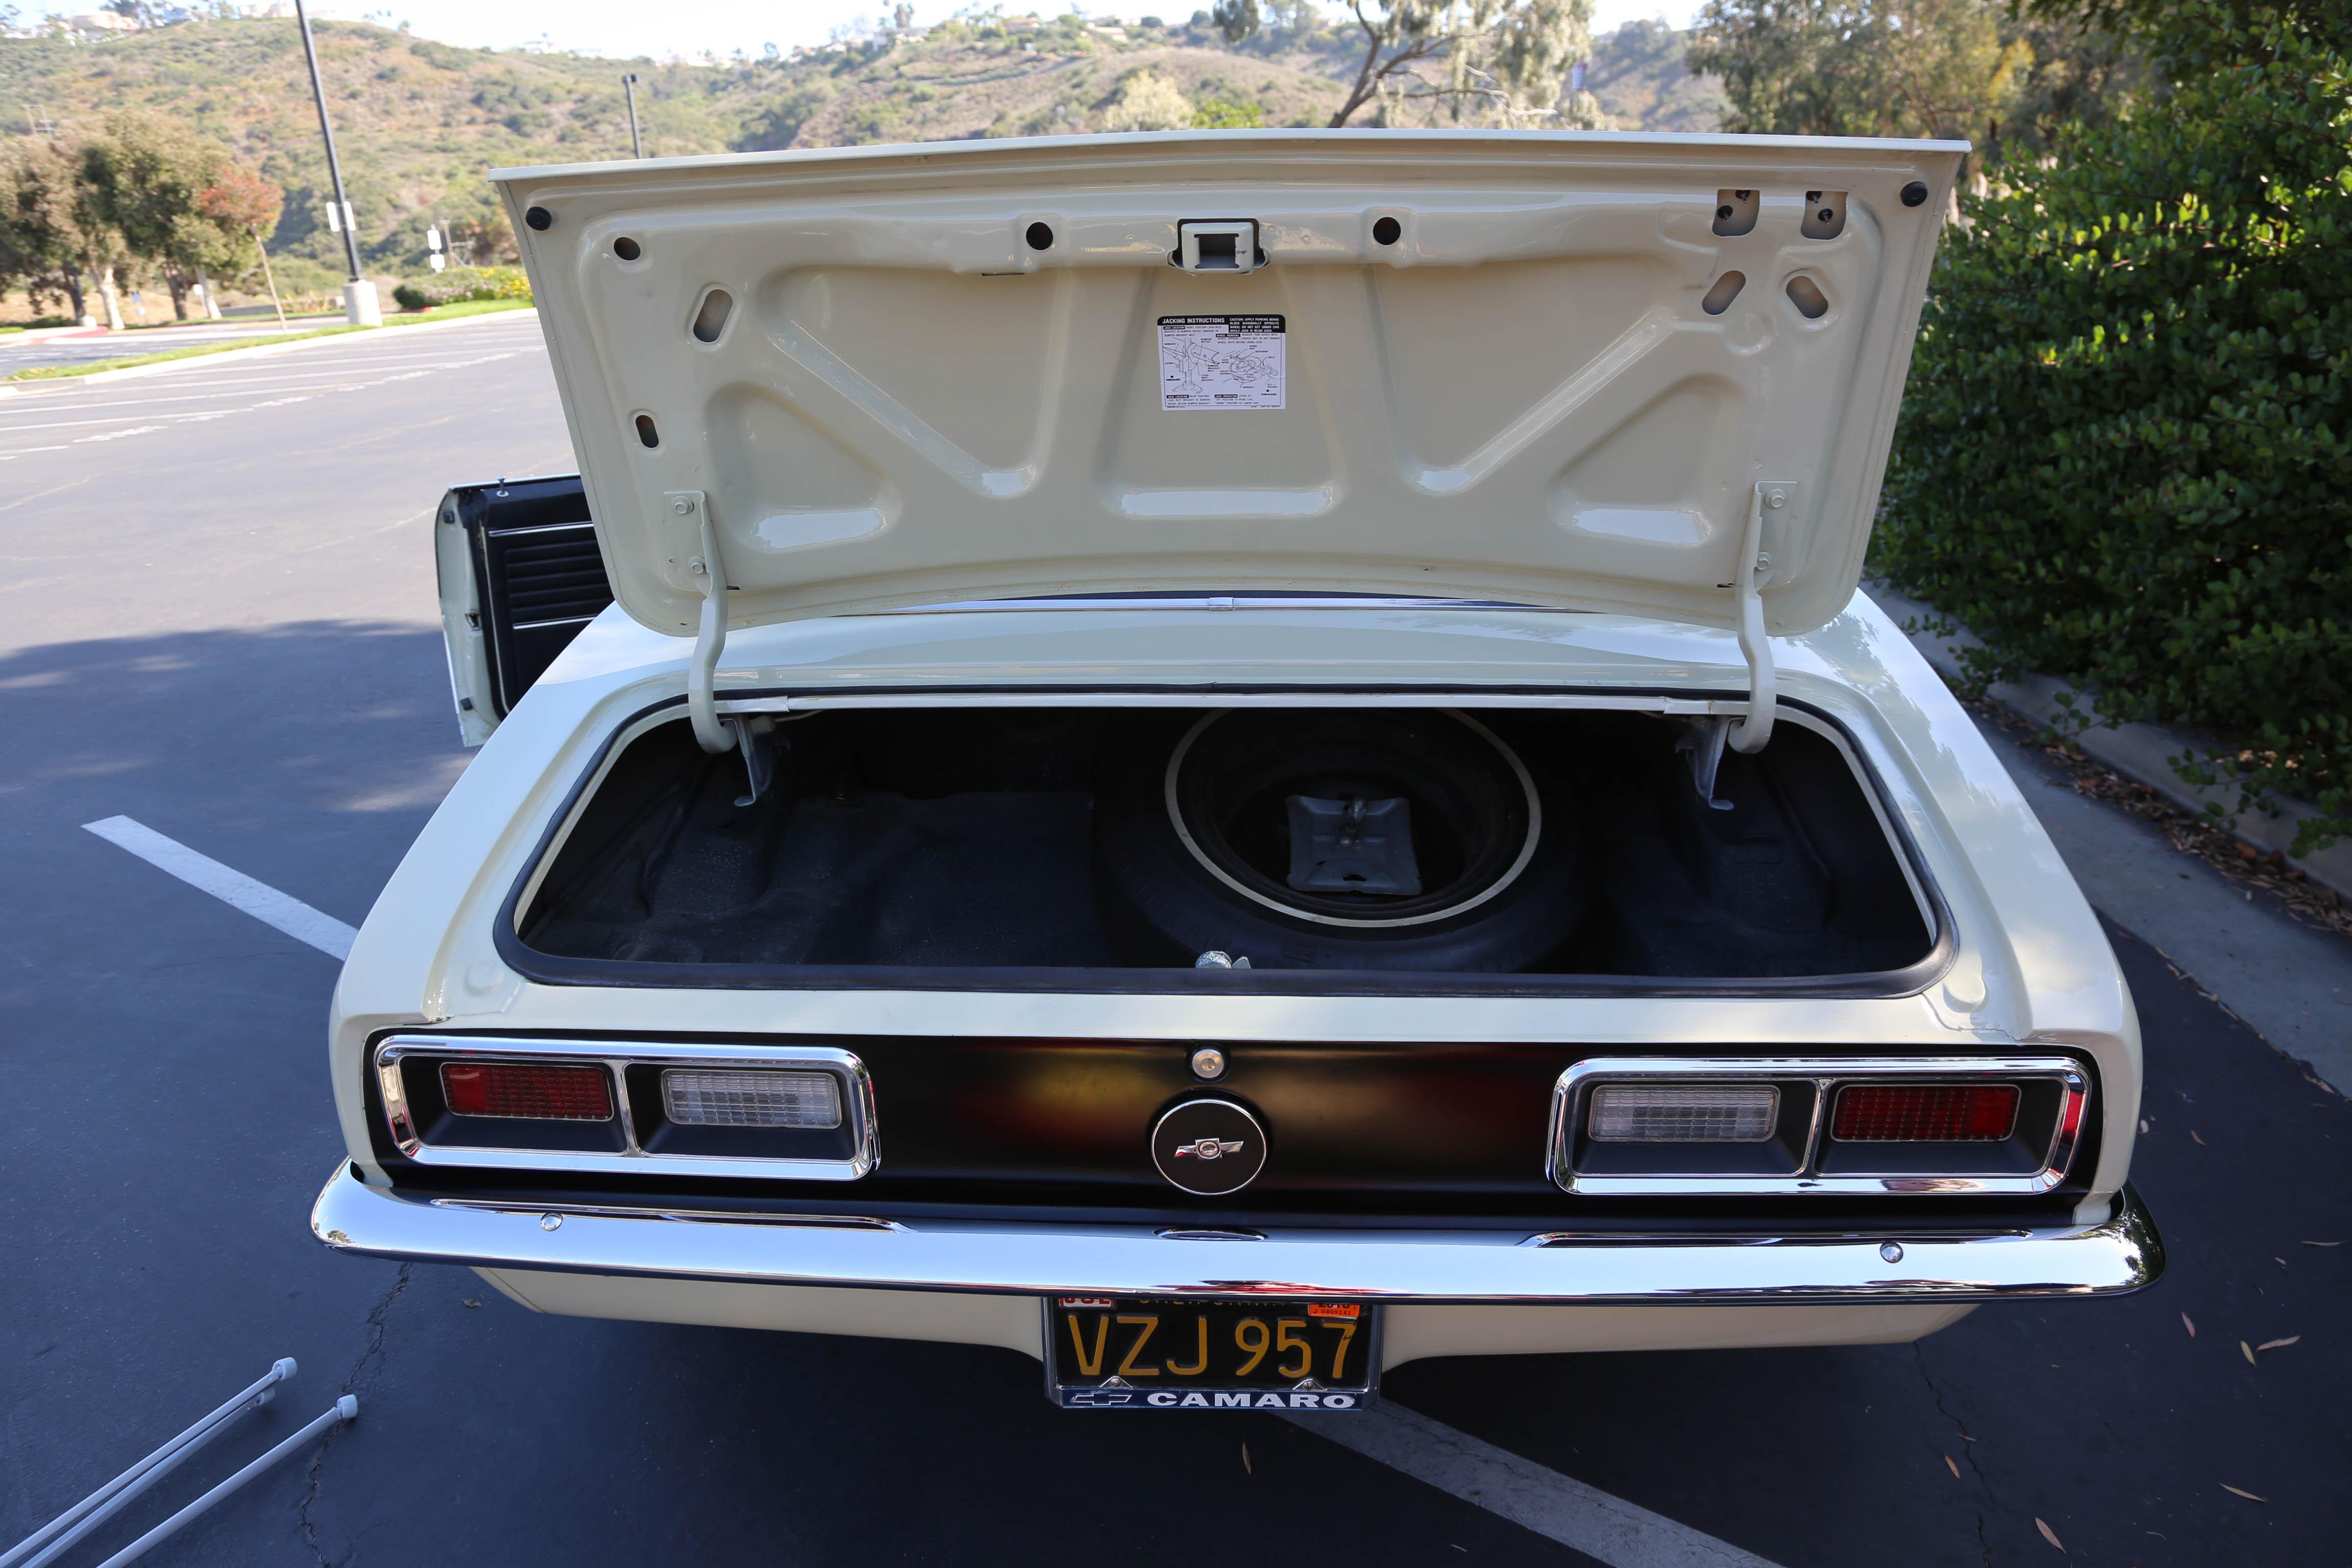 1968 Camaro Odd Options rear trunk